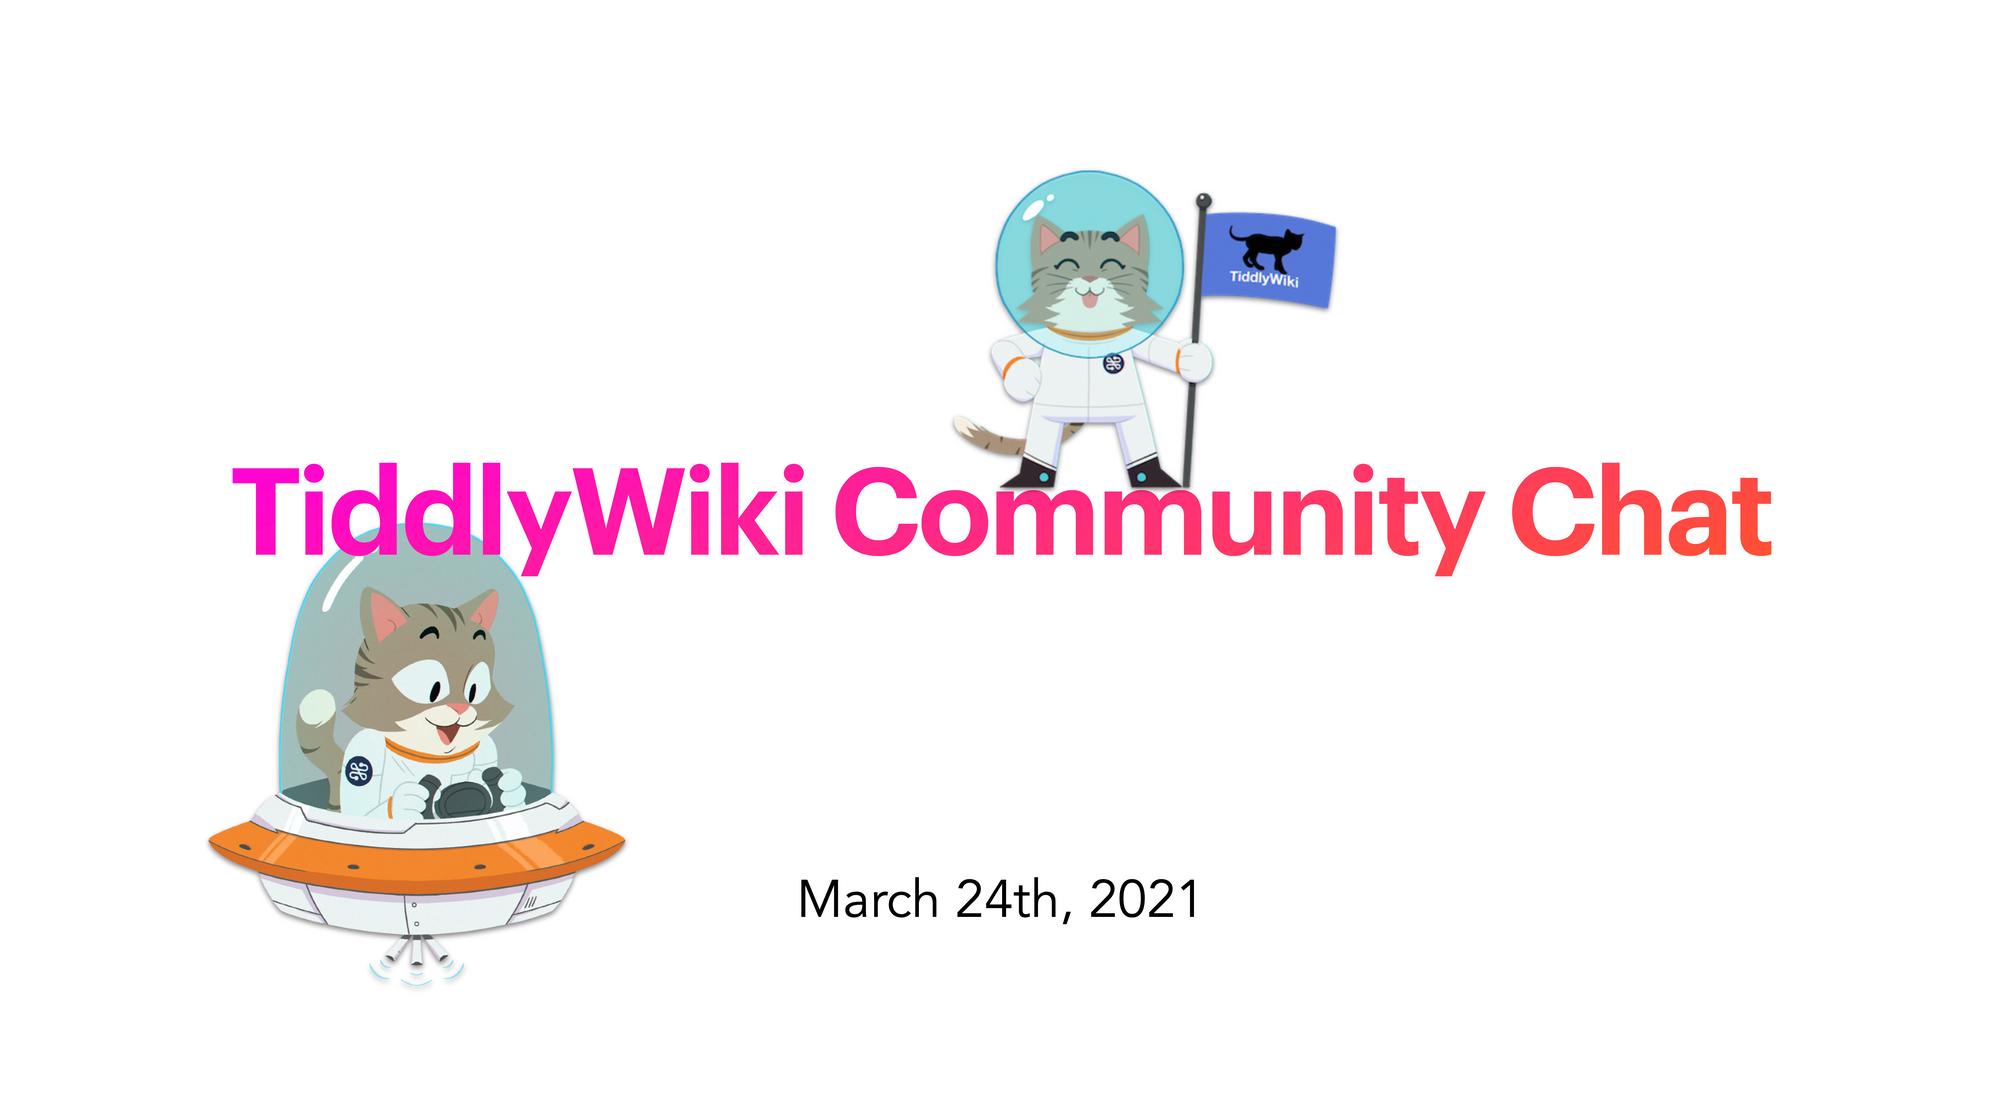 TiddlyWiki Community Chat